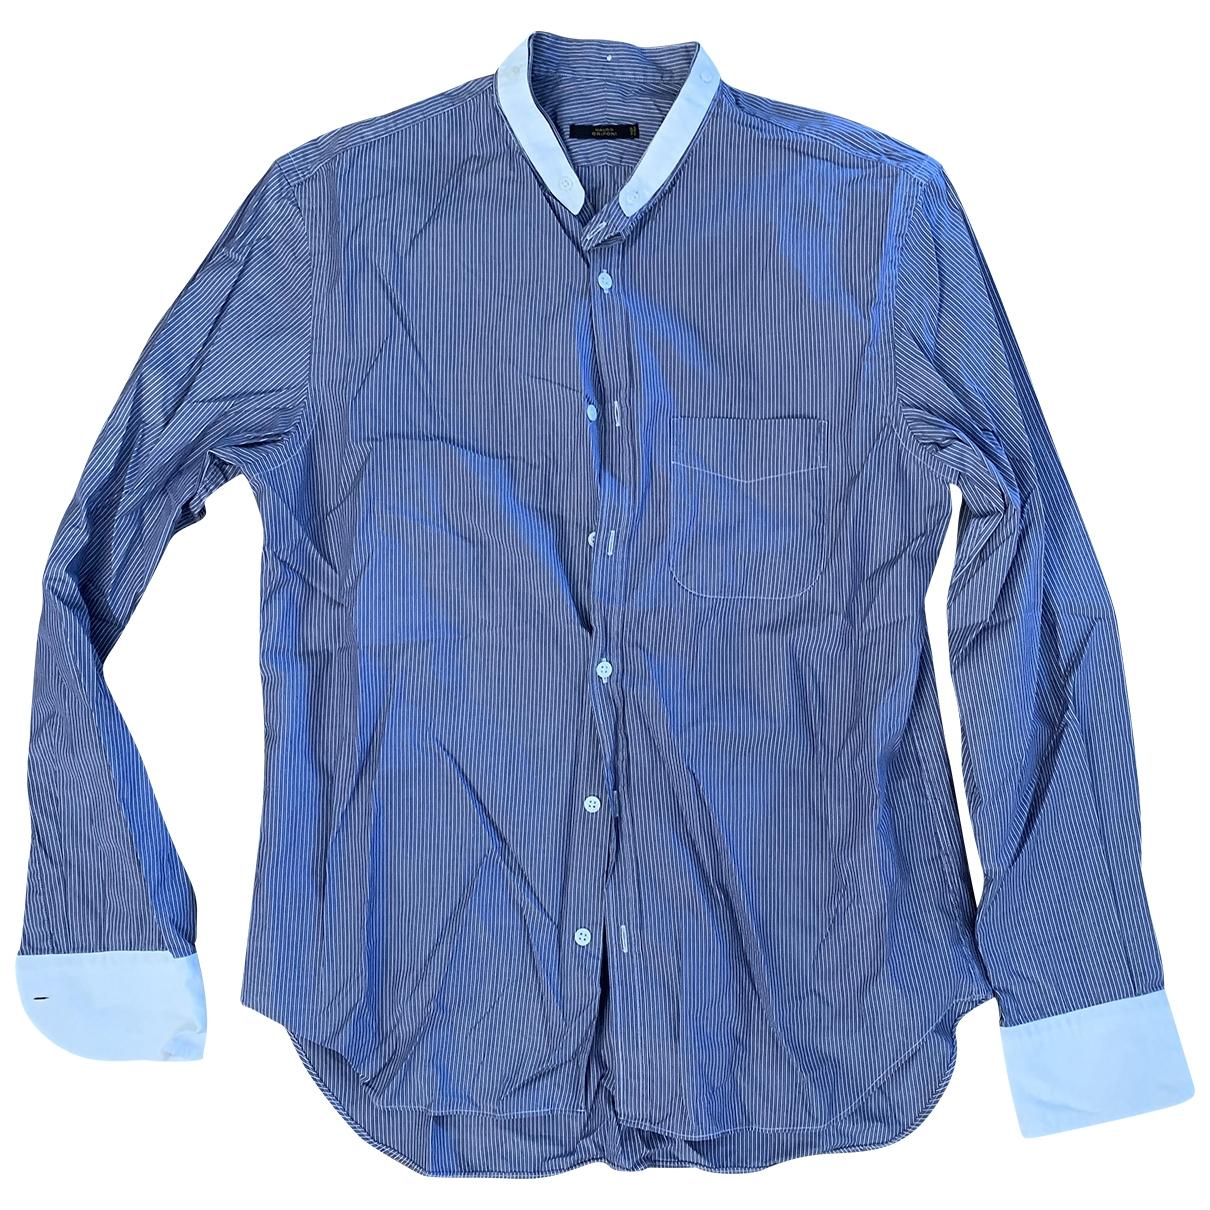 Mauro Grifoni \N Blue Cotton Shirts for Men 40 EU (tour de cou / collar)